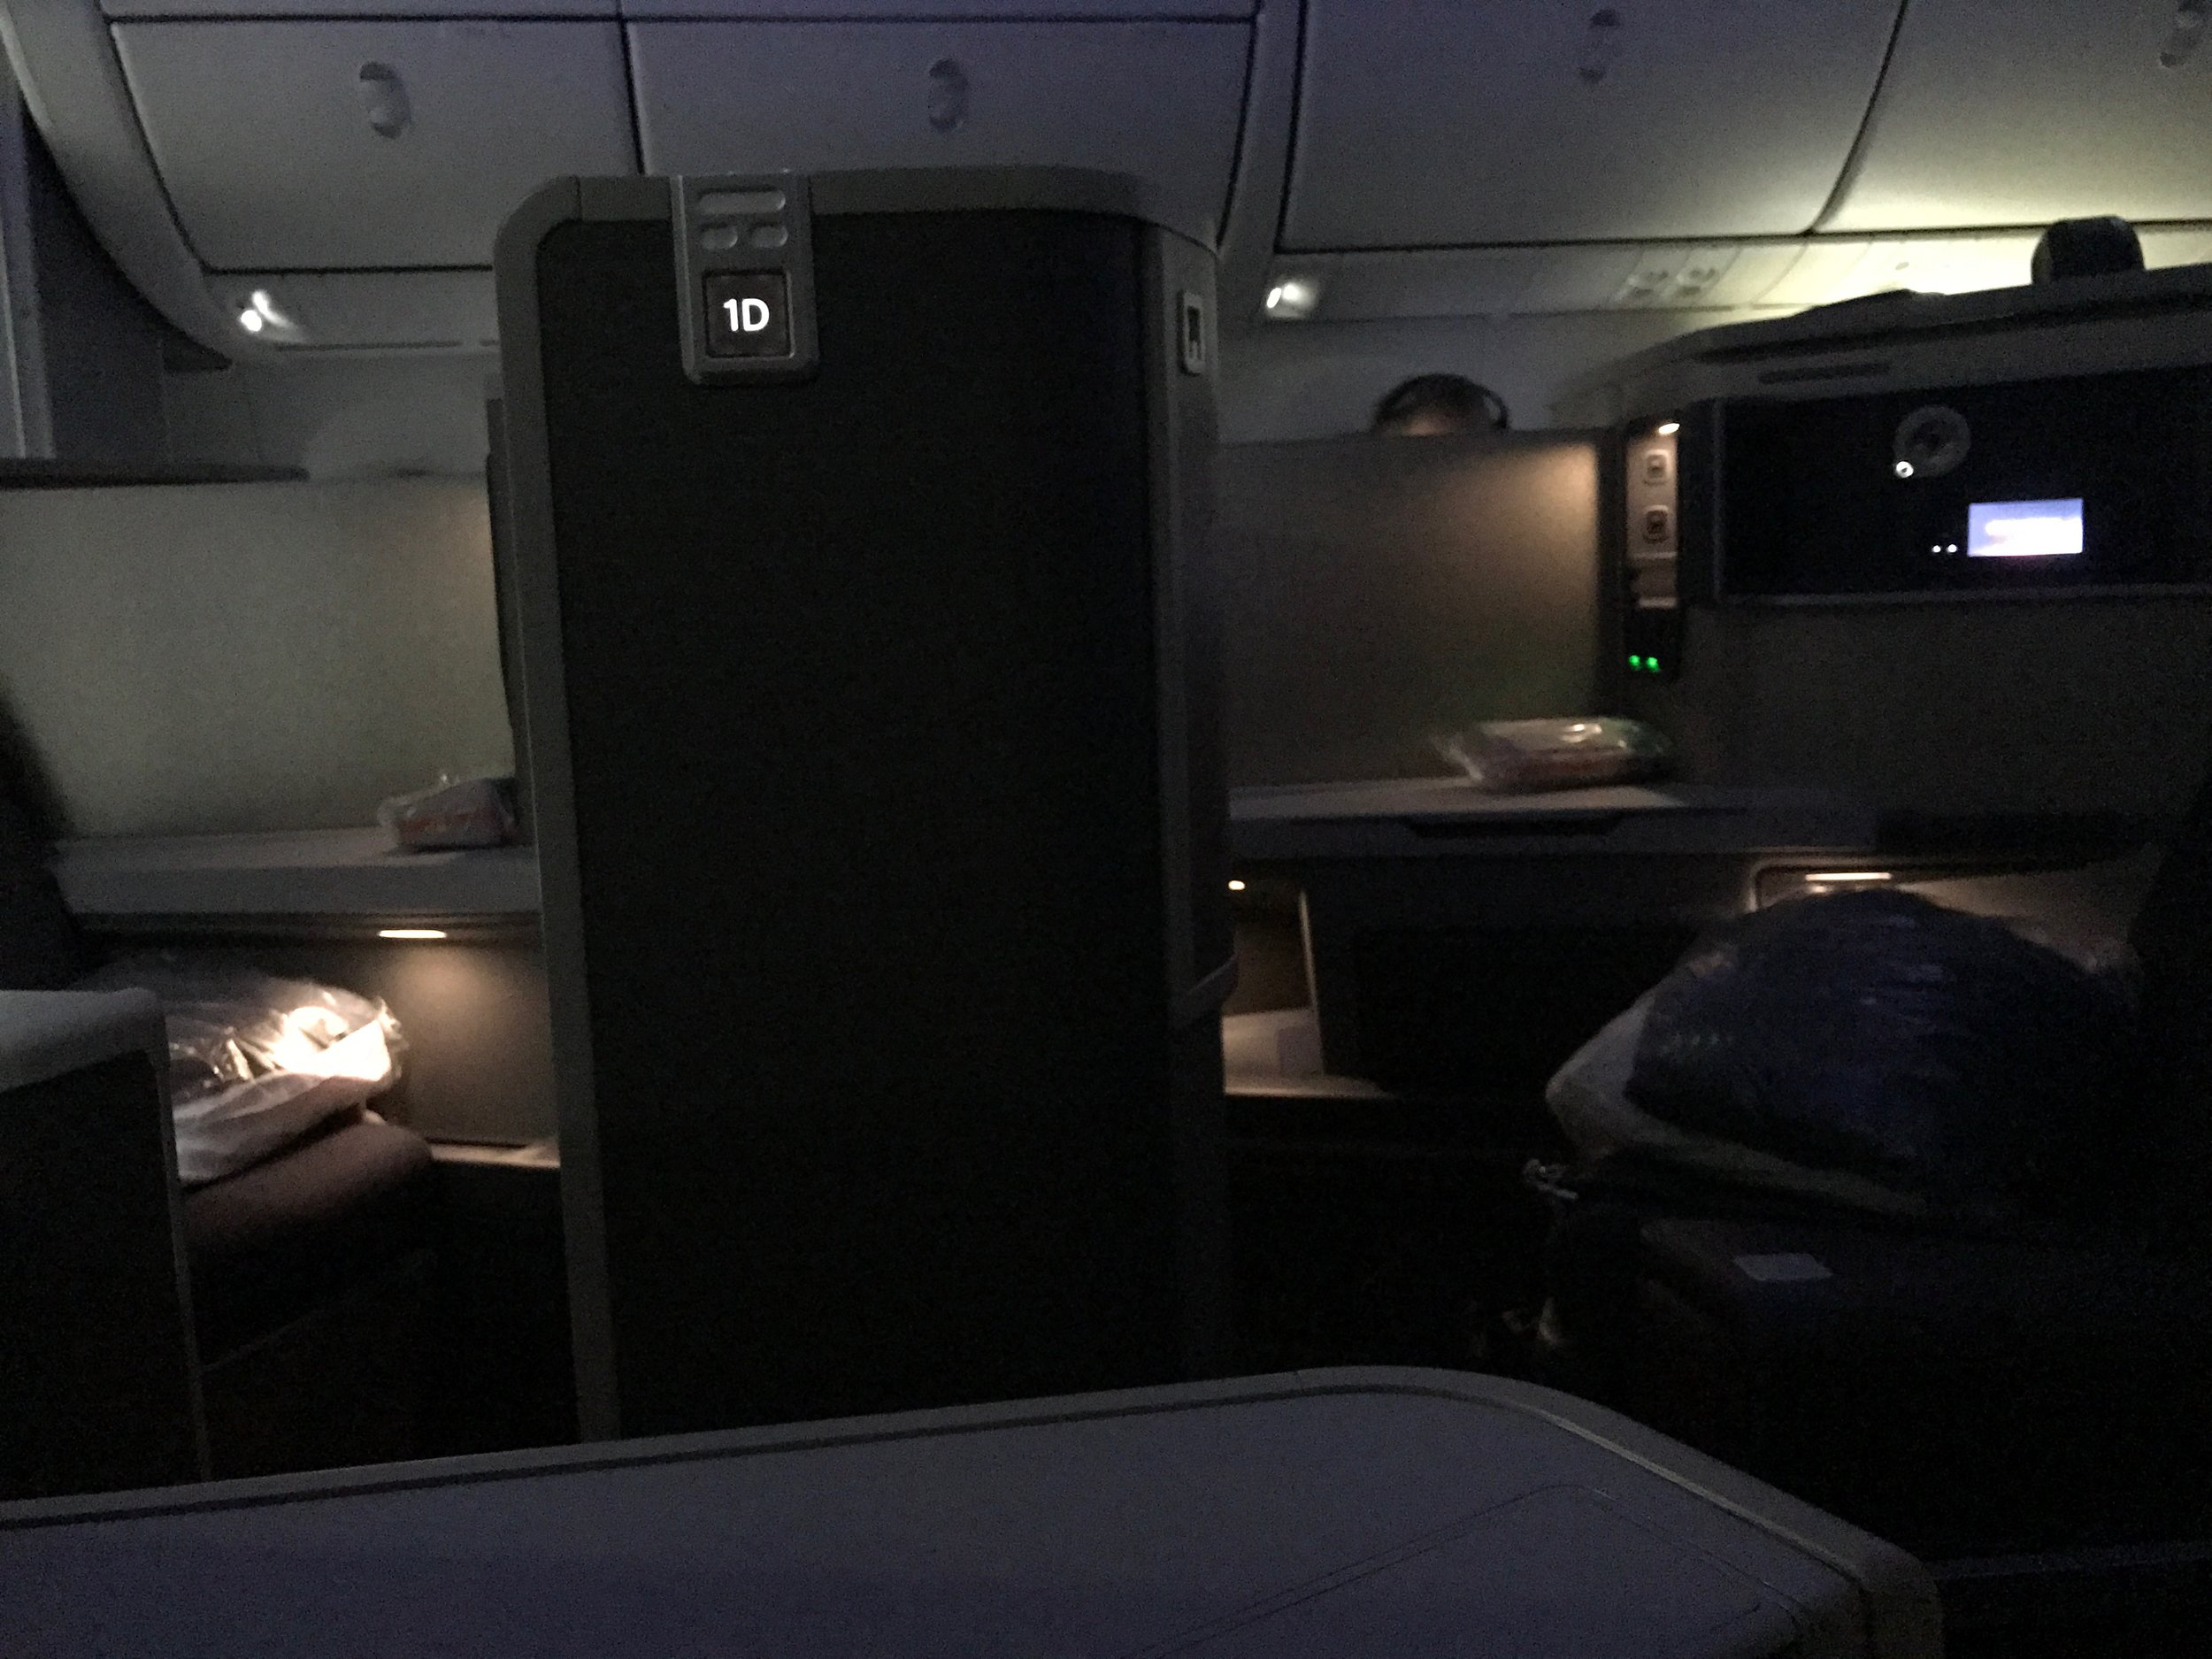 AA 787 Dreamliner Business Class suite lights